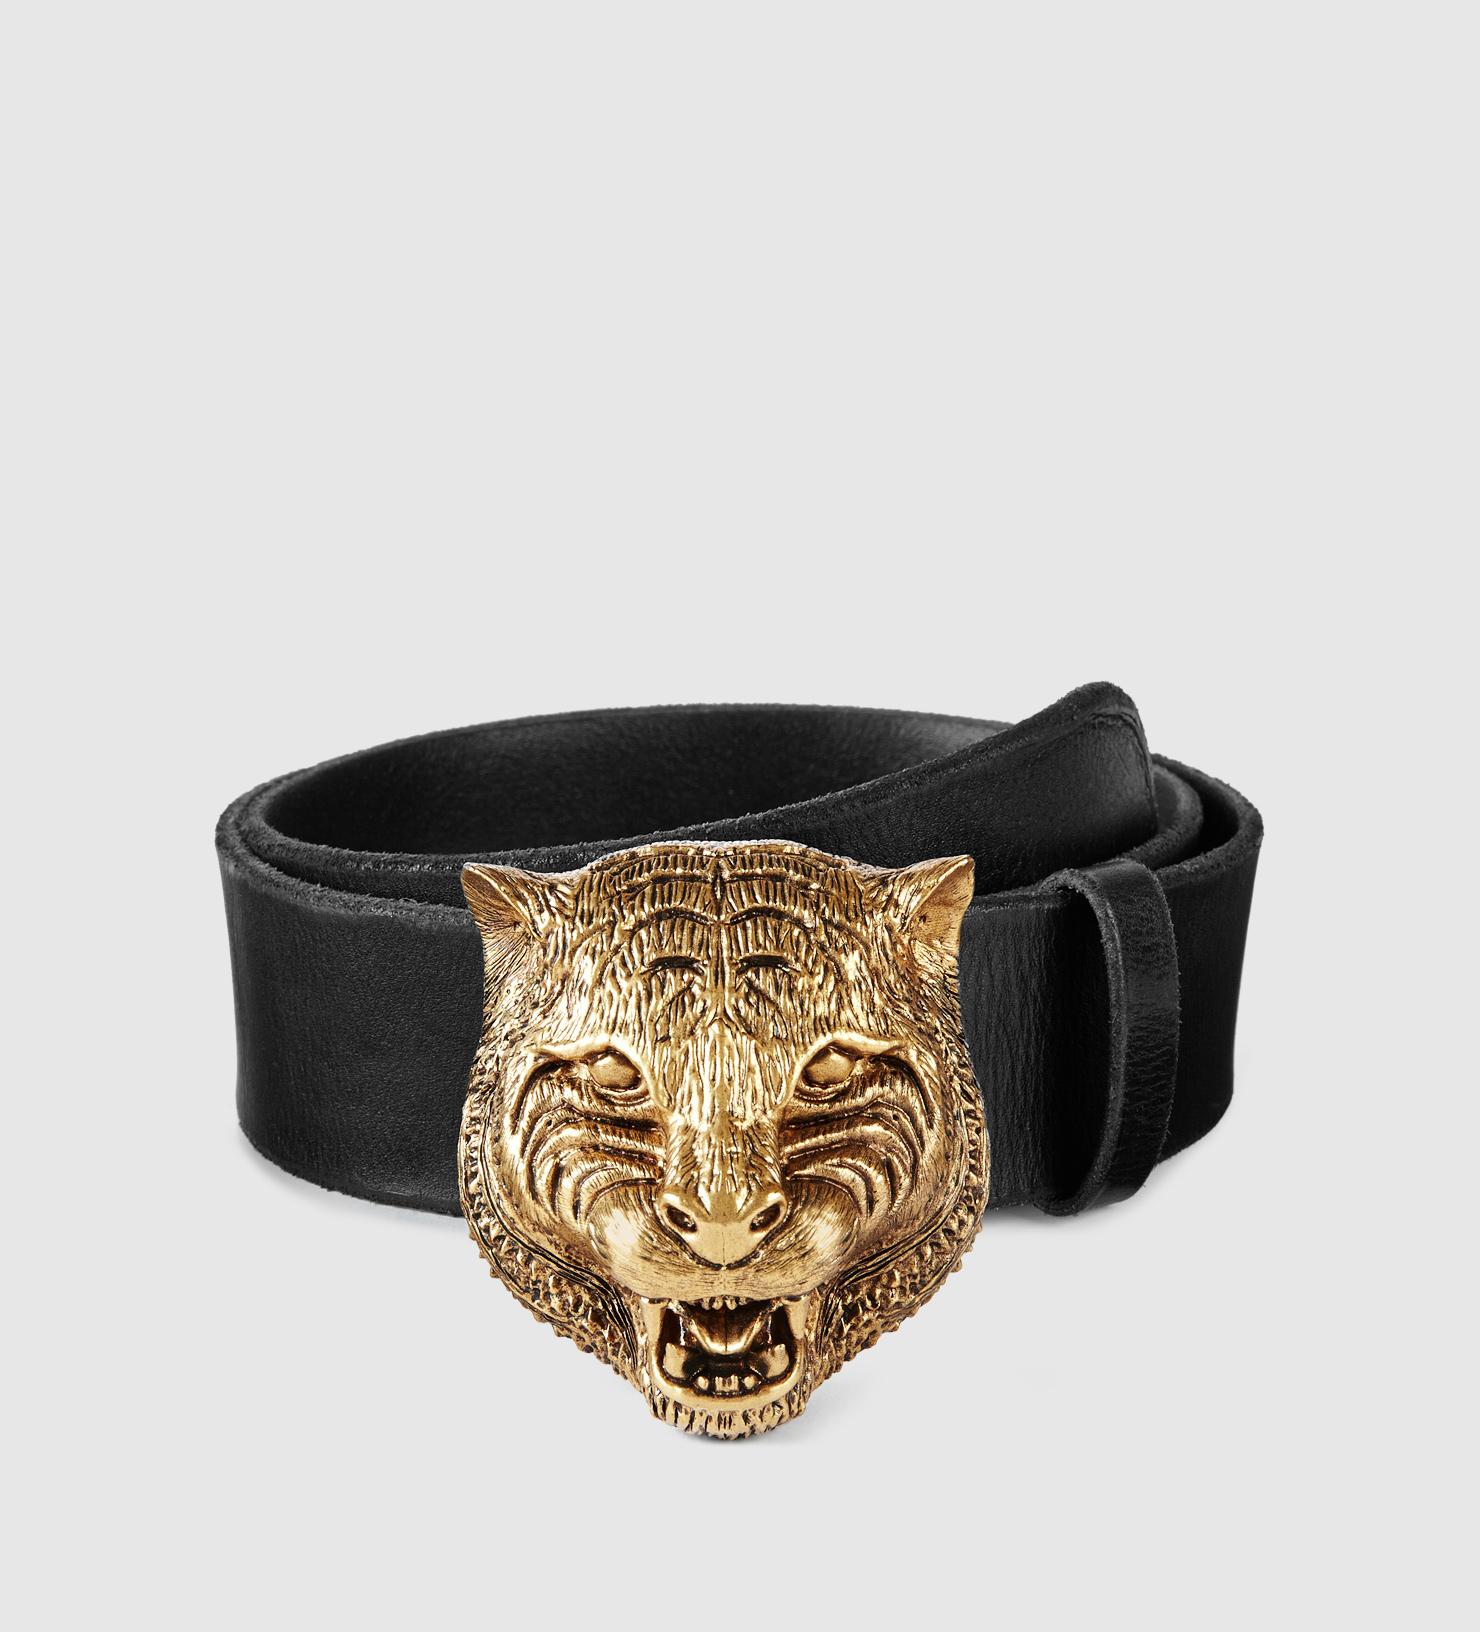 Lyst - Gucci Leather Belt With Feline Buckle in Metallic